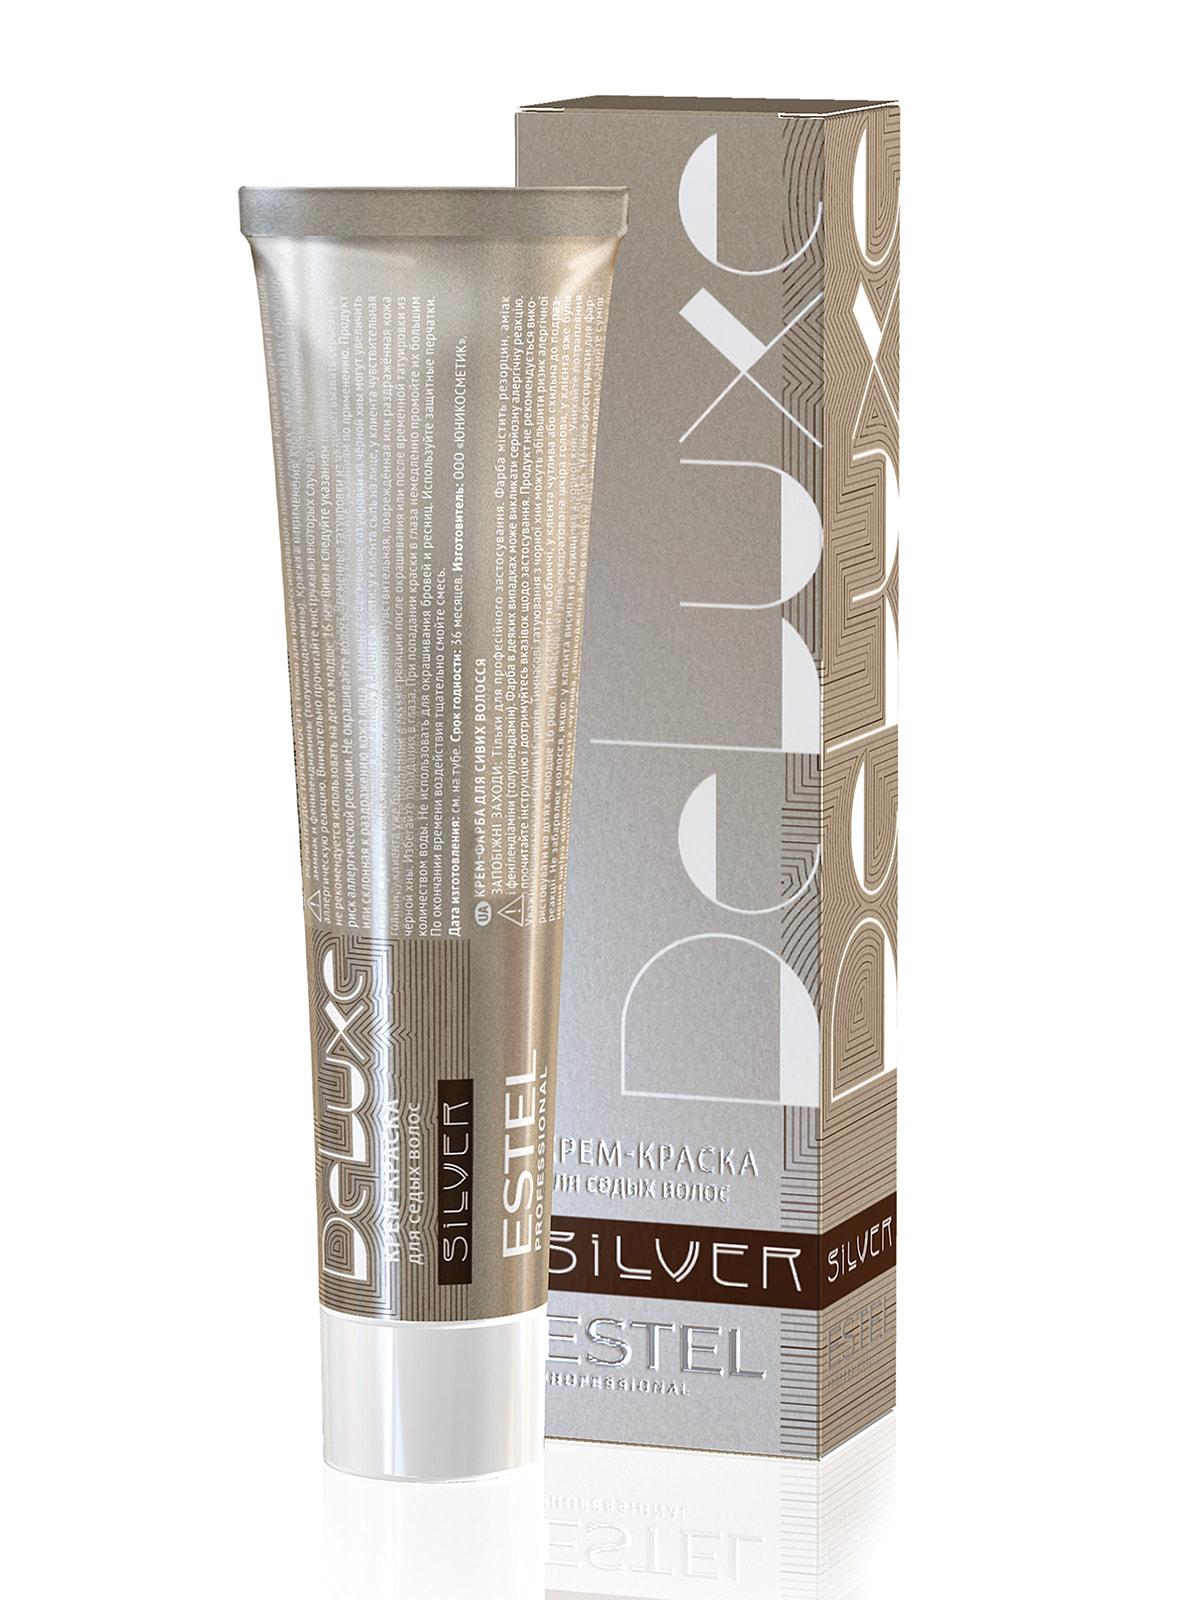 Крем-краска De Luxe Silver - шатен коричневый (60 мл) | 4693762 | фото 2